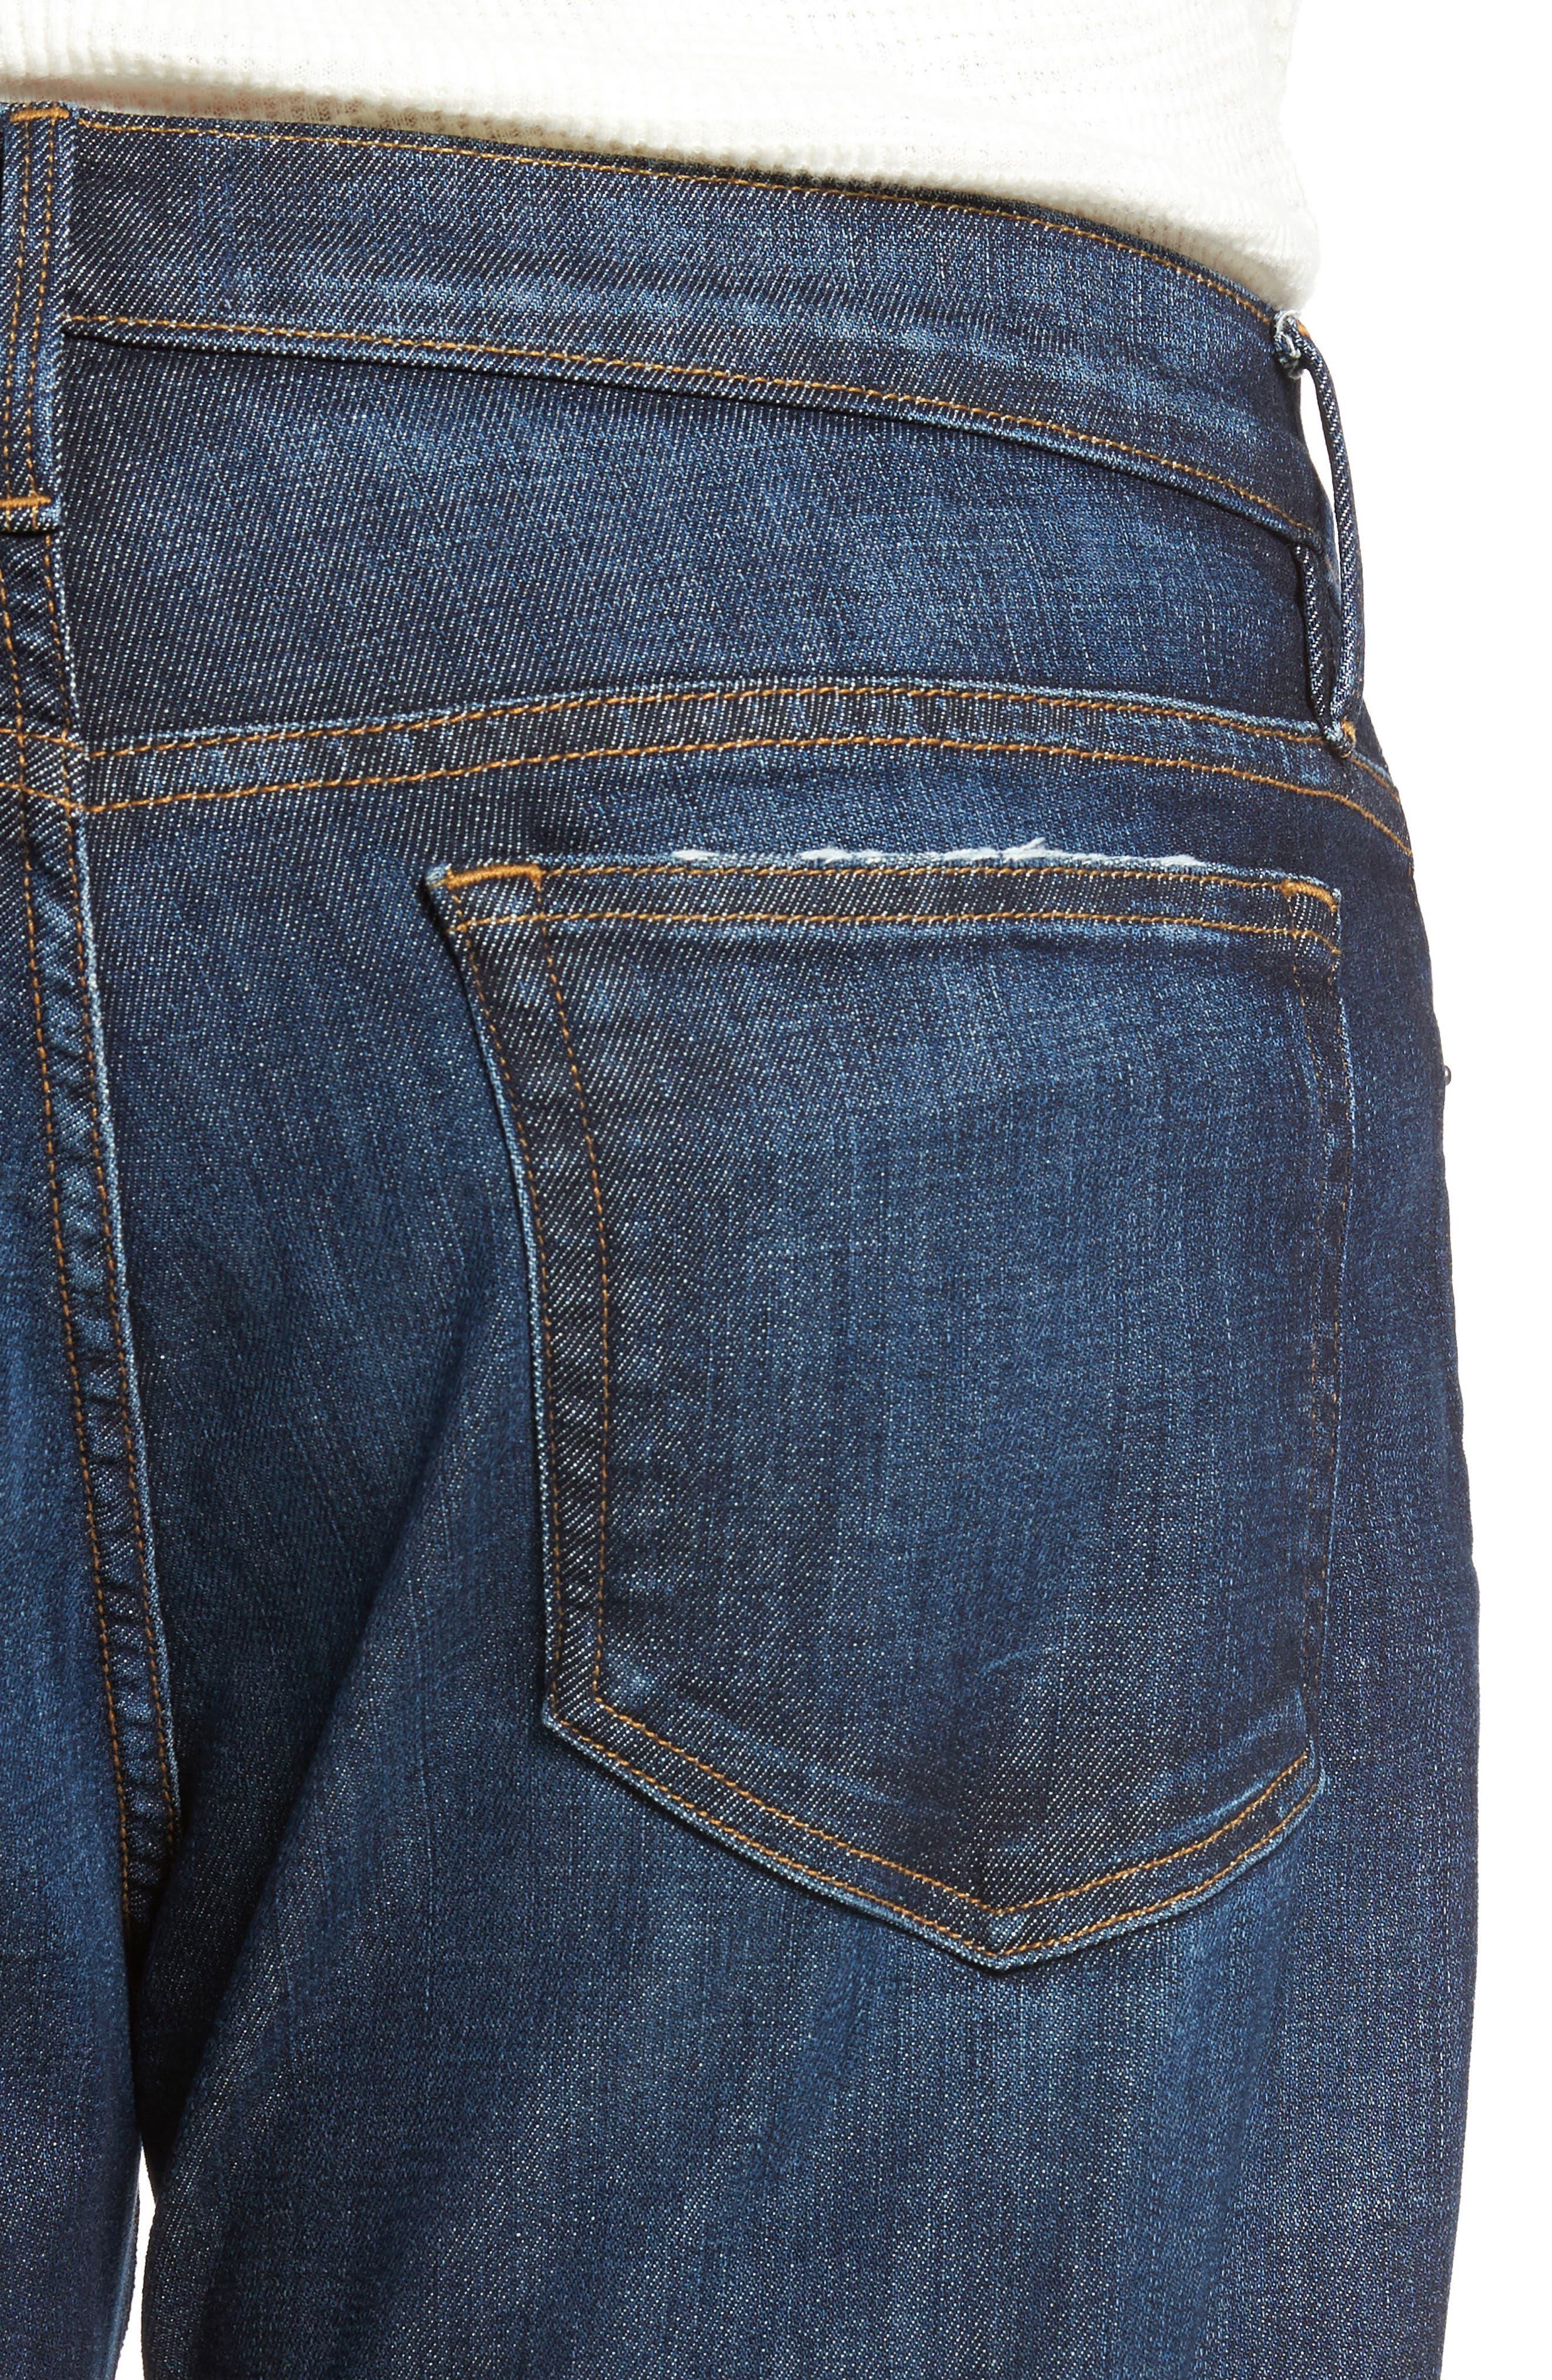 L'Homme Slim Straight Leg Jeans,                             Alternate thumbnail 4, color,                             401